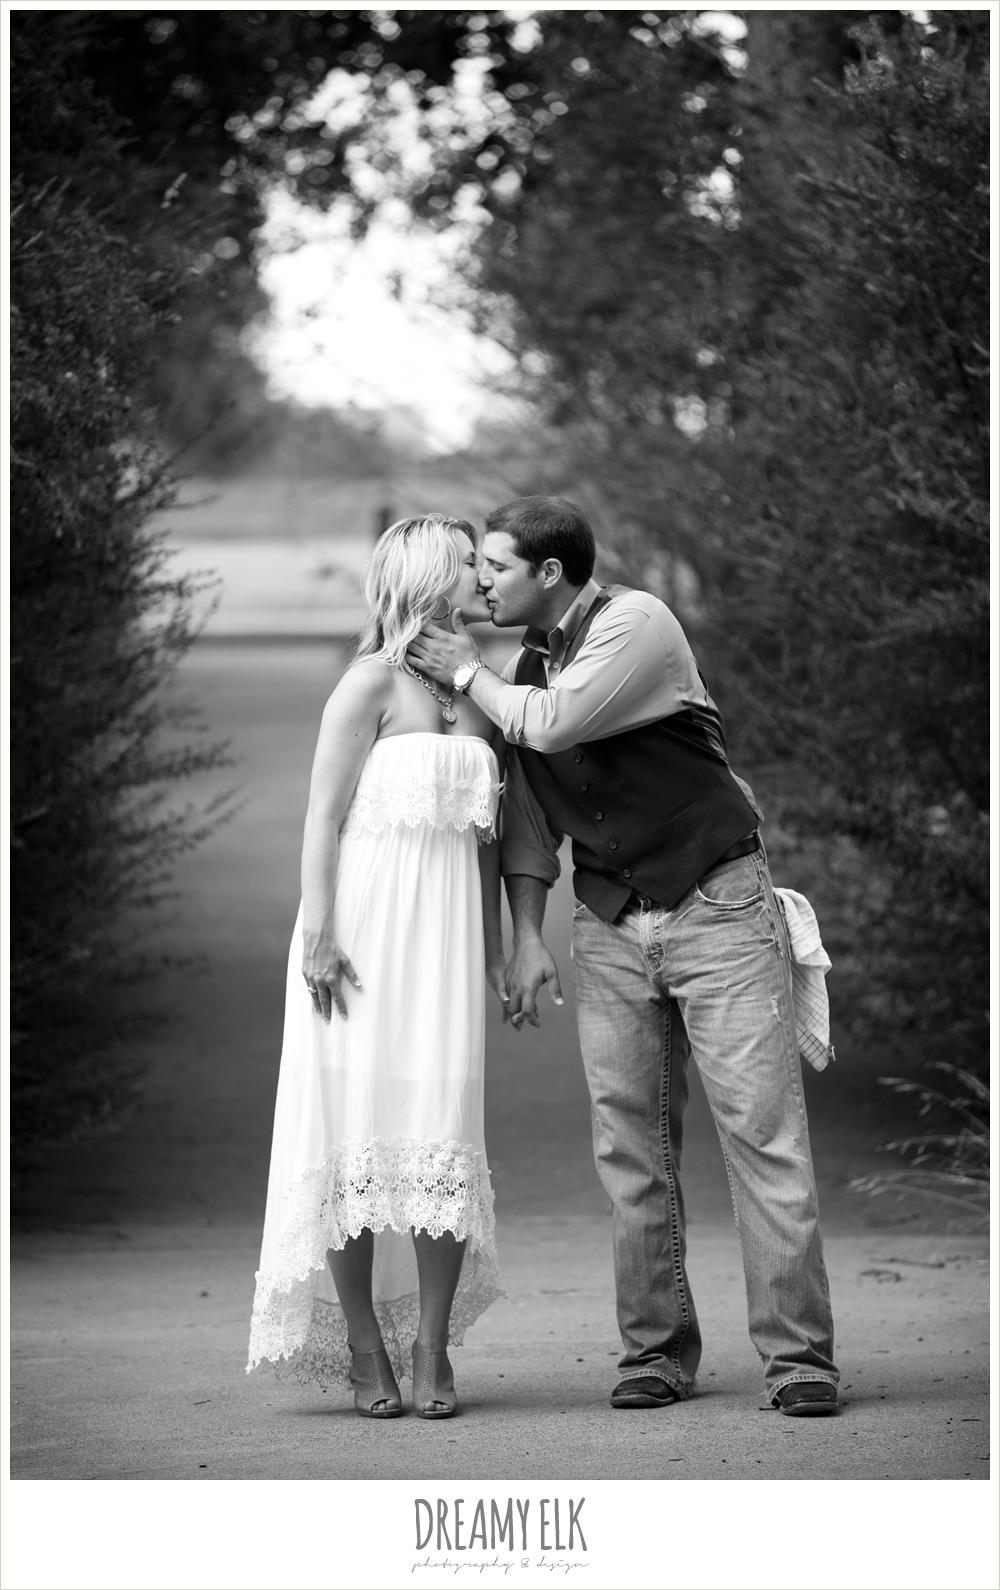 romantic outdoor engagement photo, jeans and vest, white dress, couple kissing